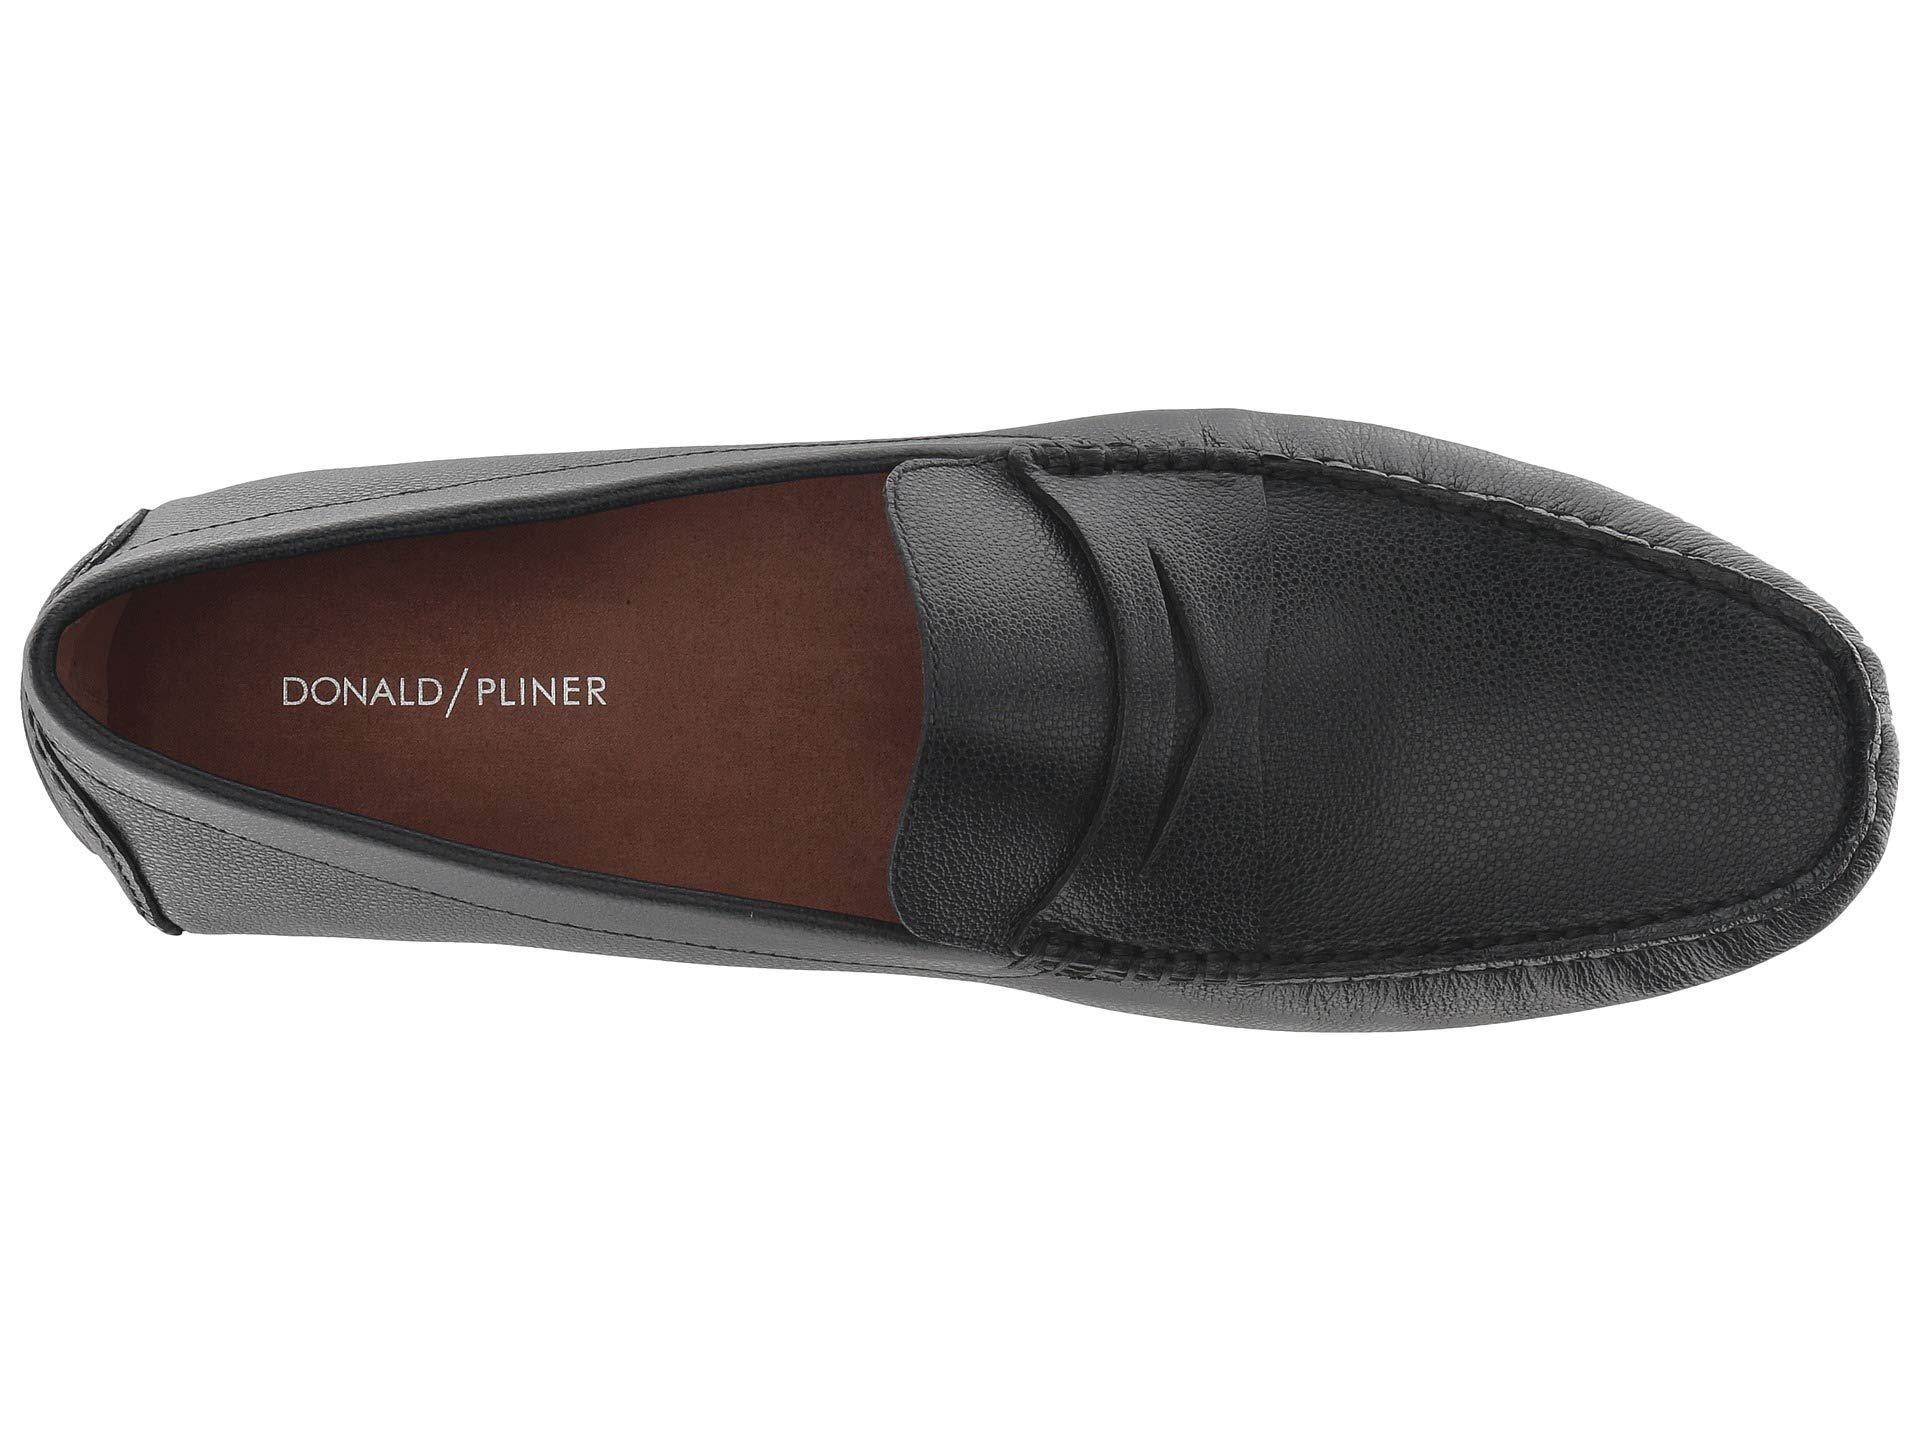 f3d04854fea Lyst - Donald J Pliner Vinco (navy) Men s Slip On Shoes in Blue for Men